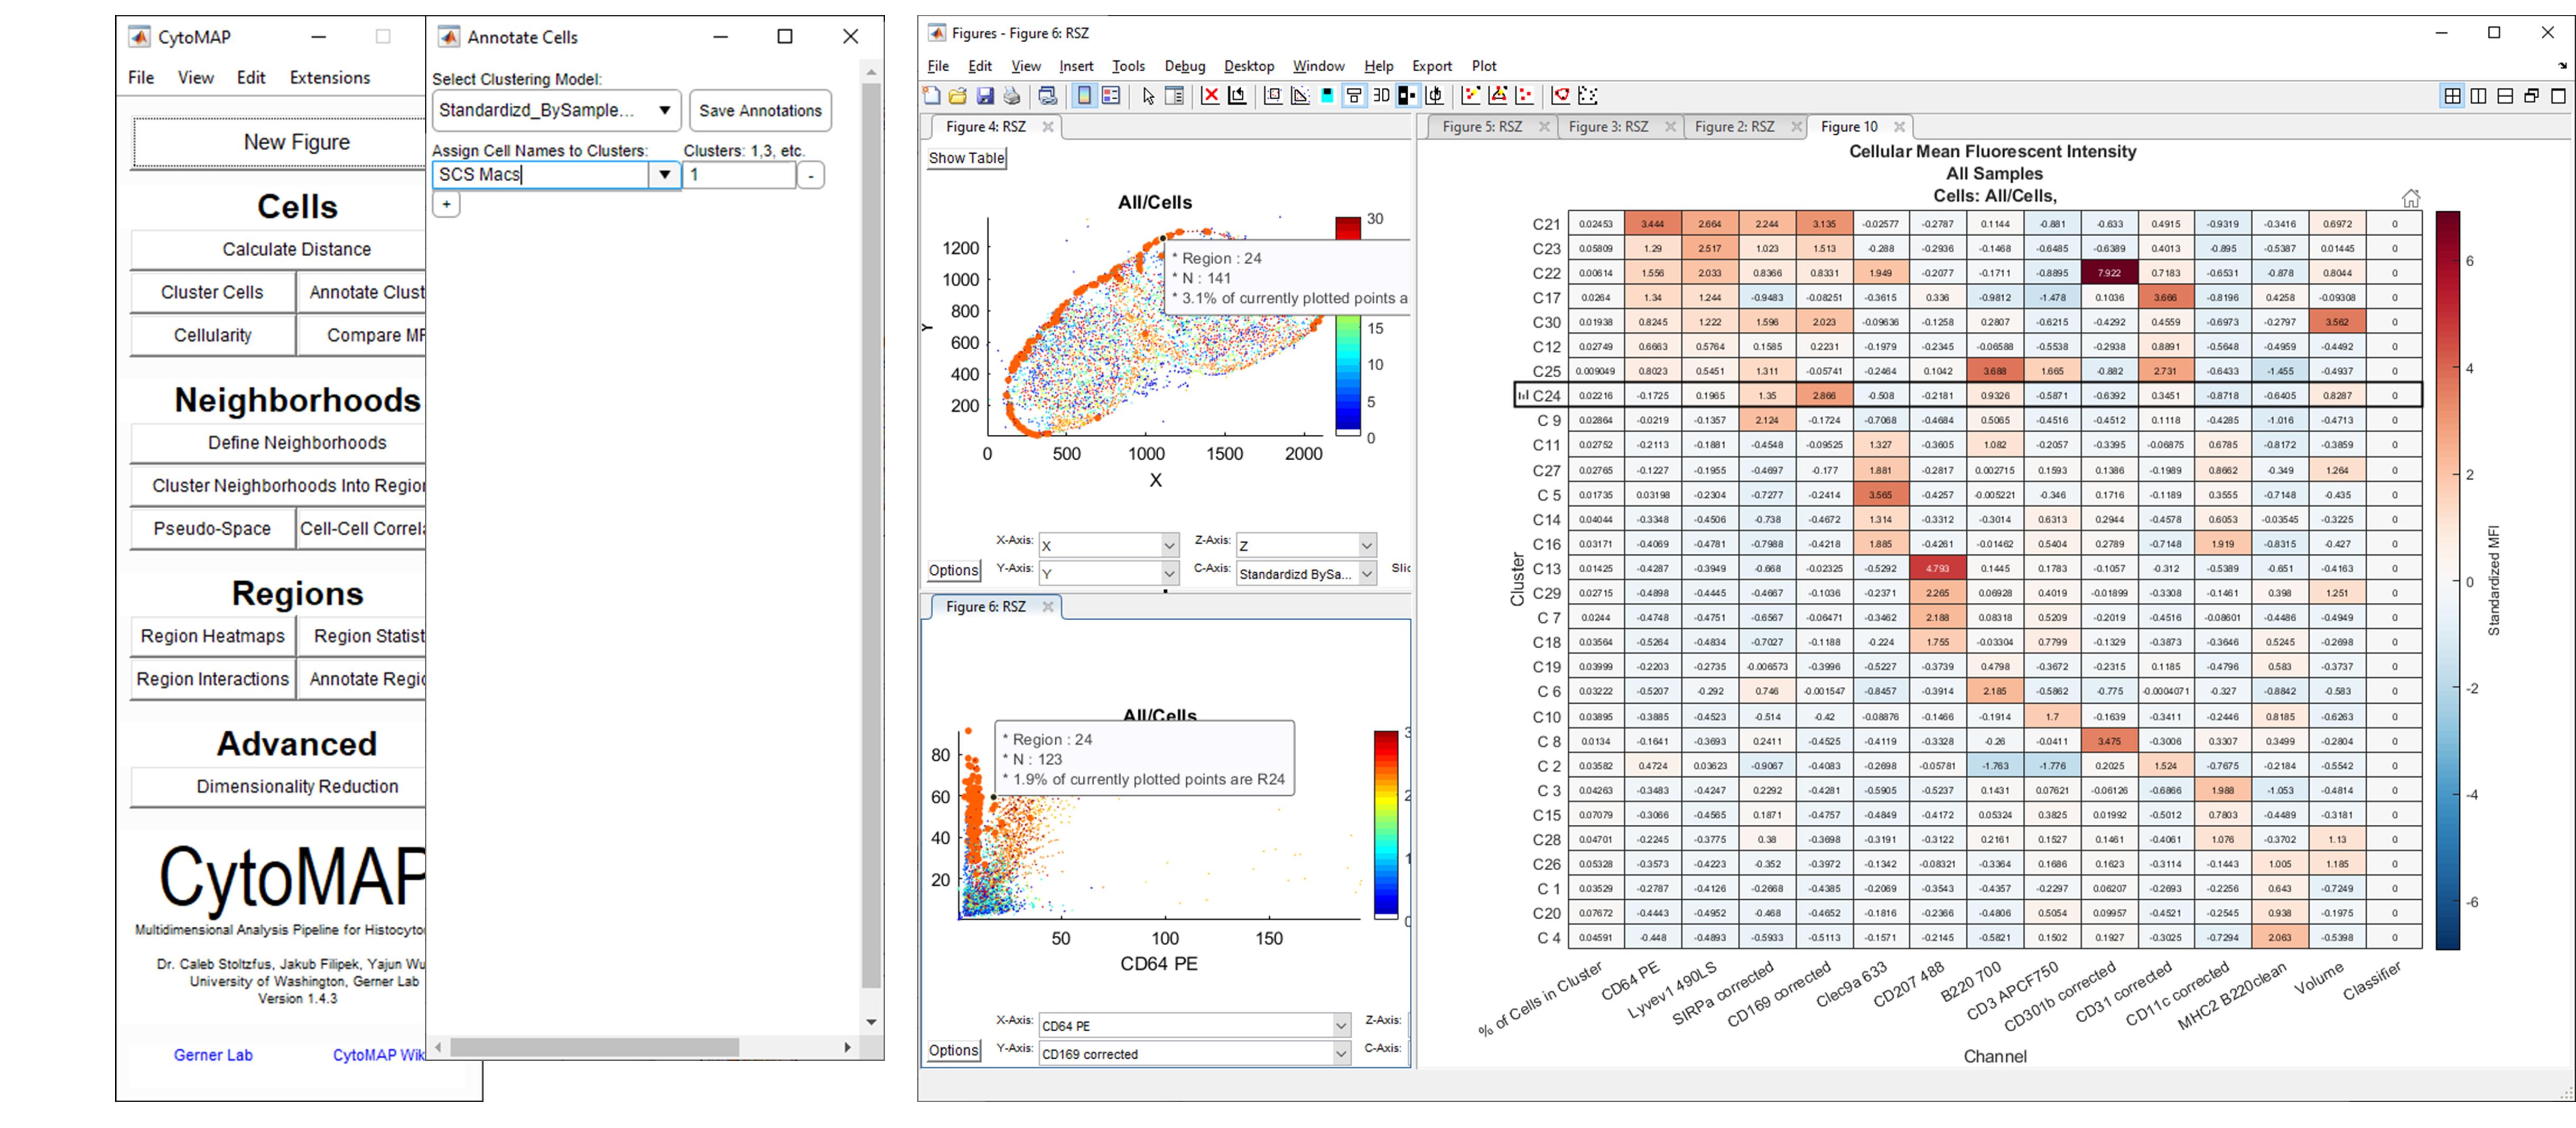 Cell MFI Heatmaps